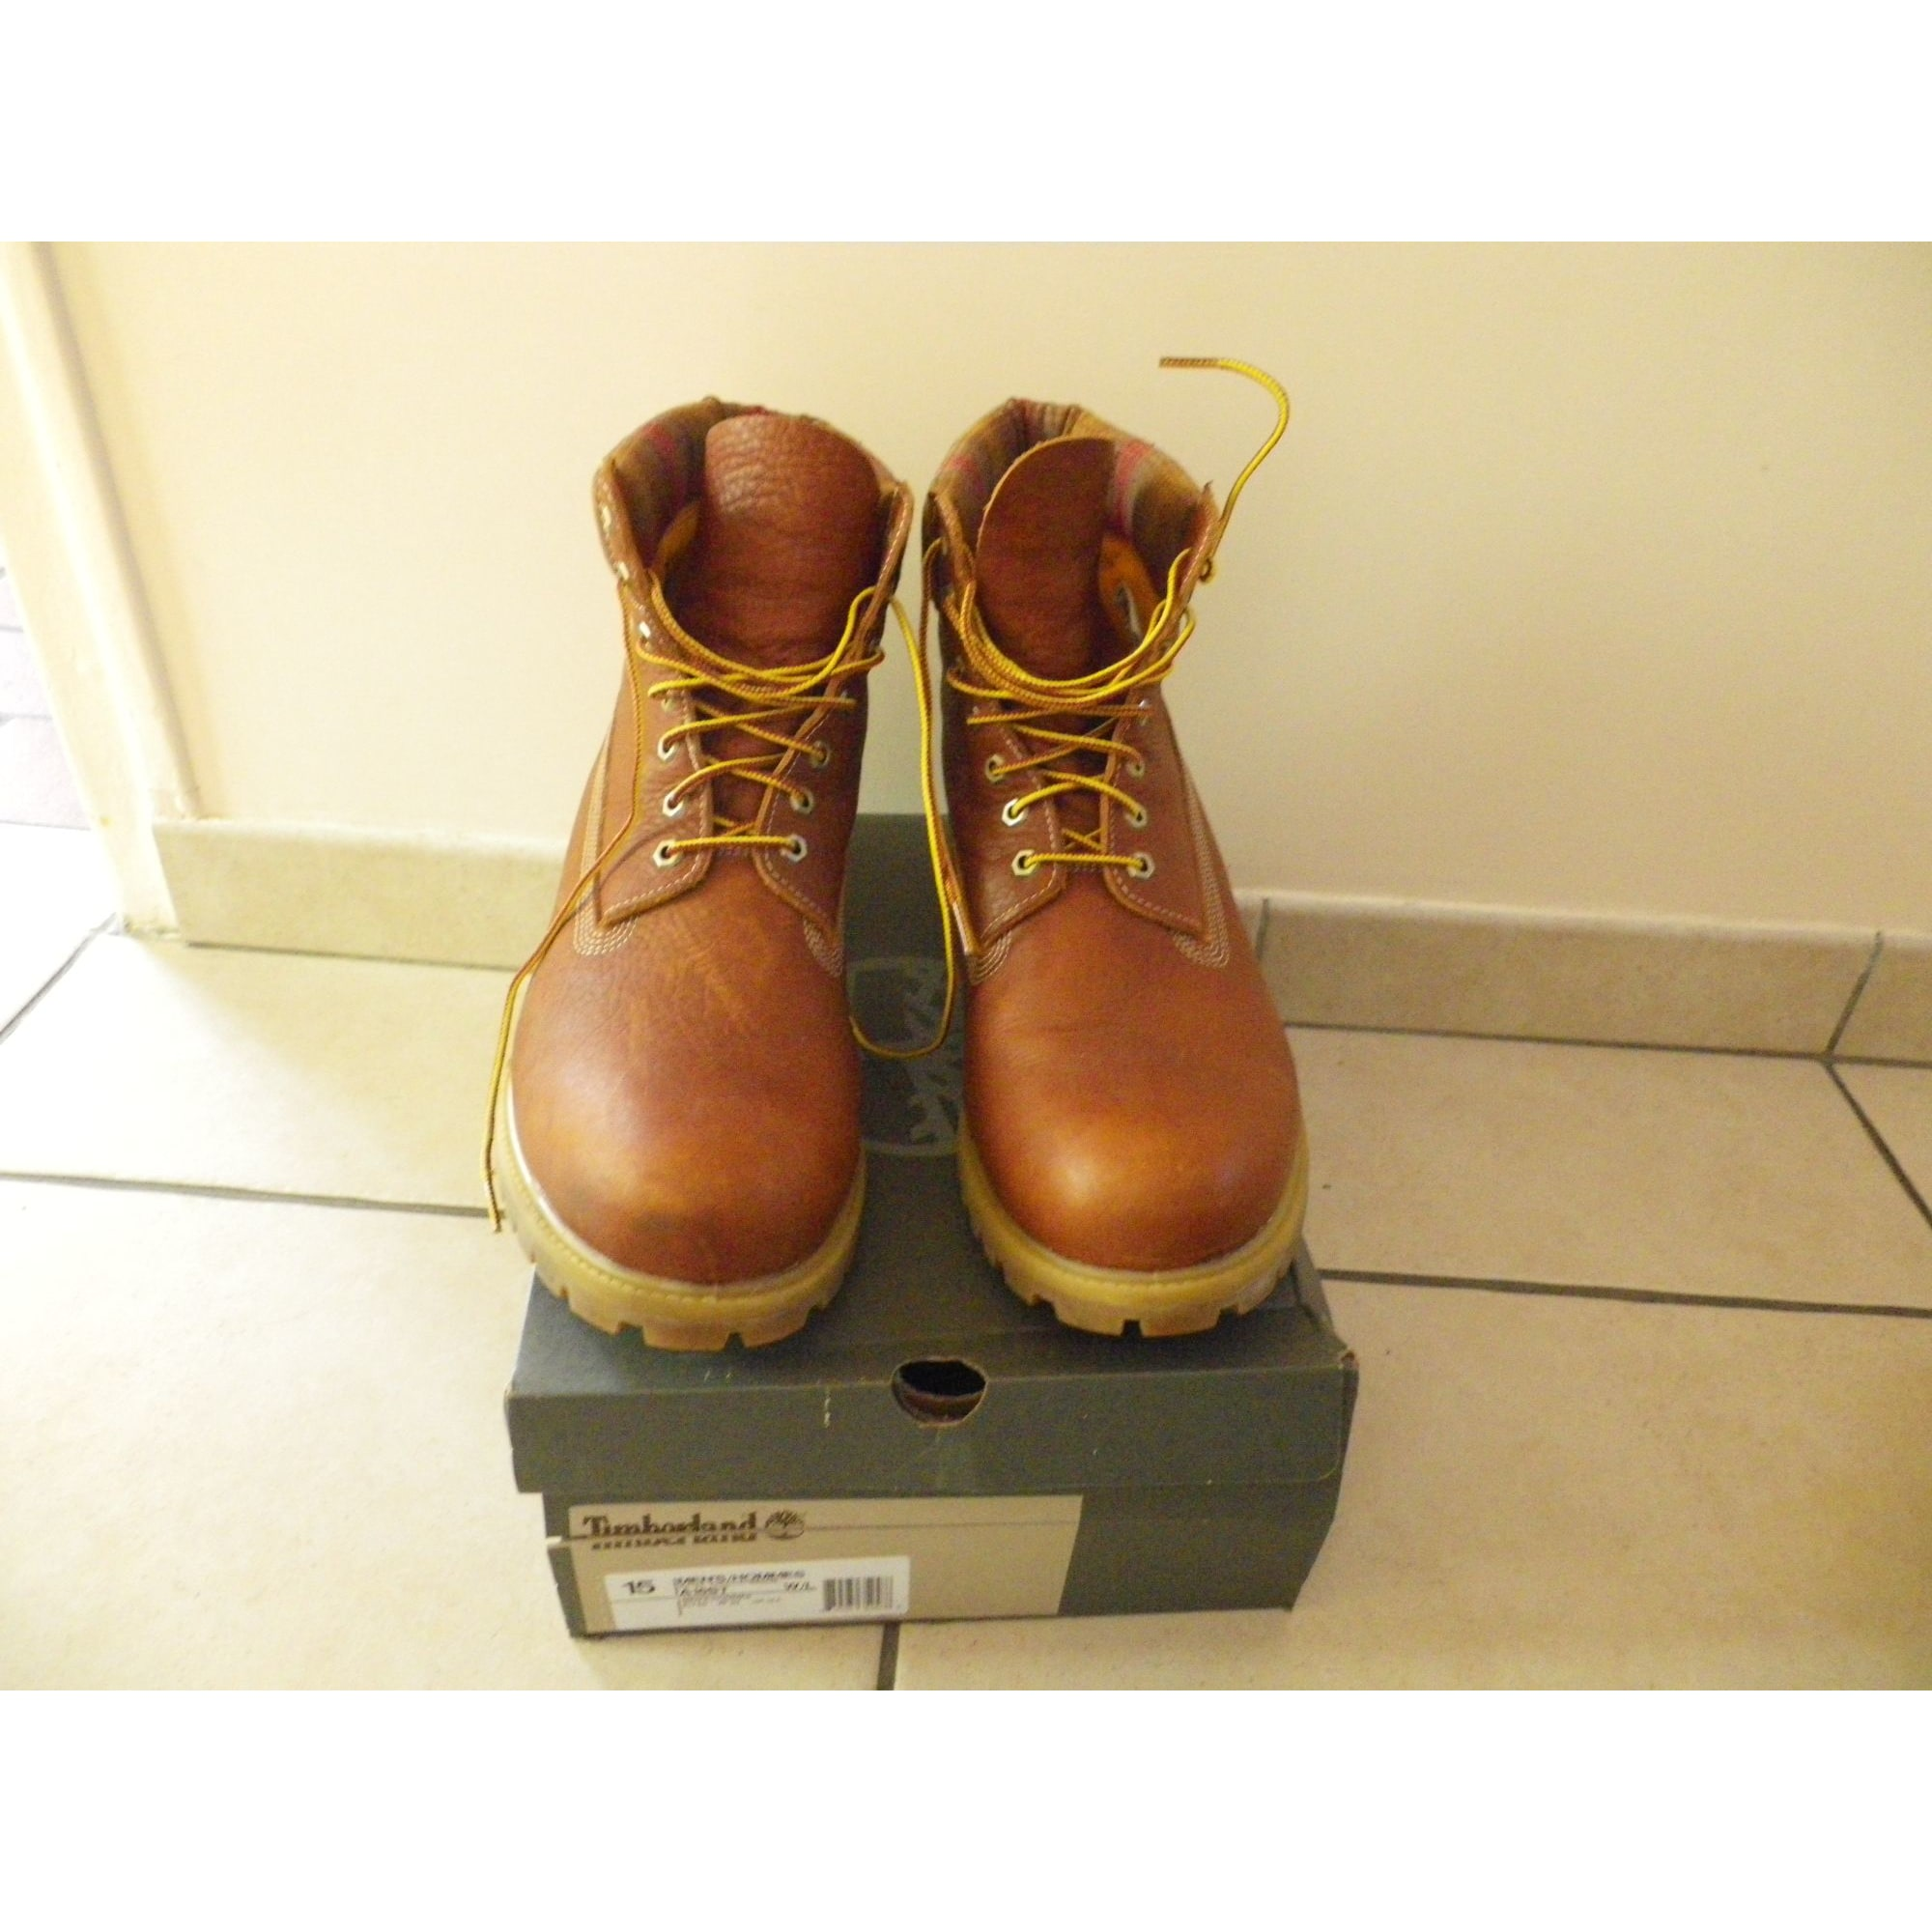 chaussures timberland 50